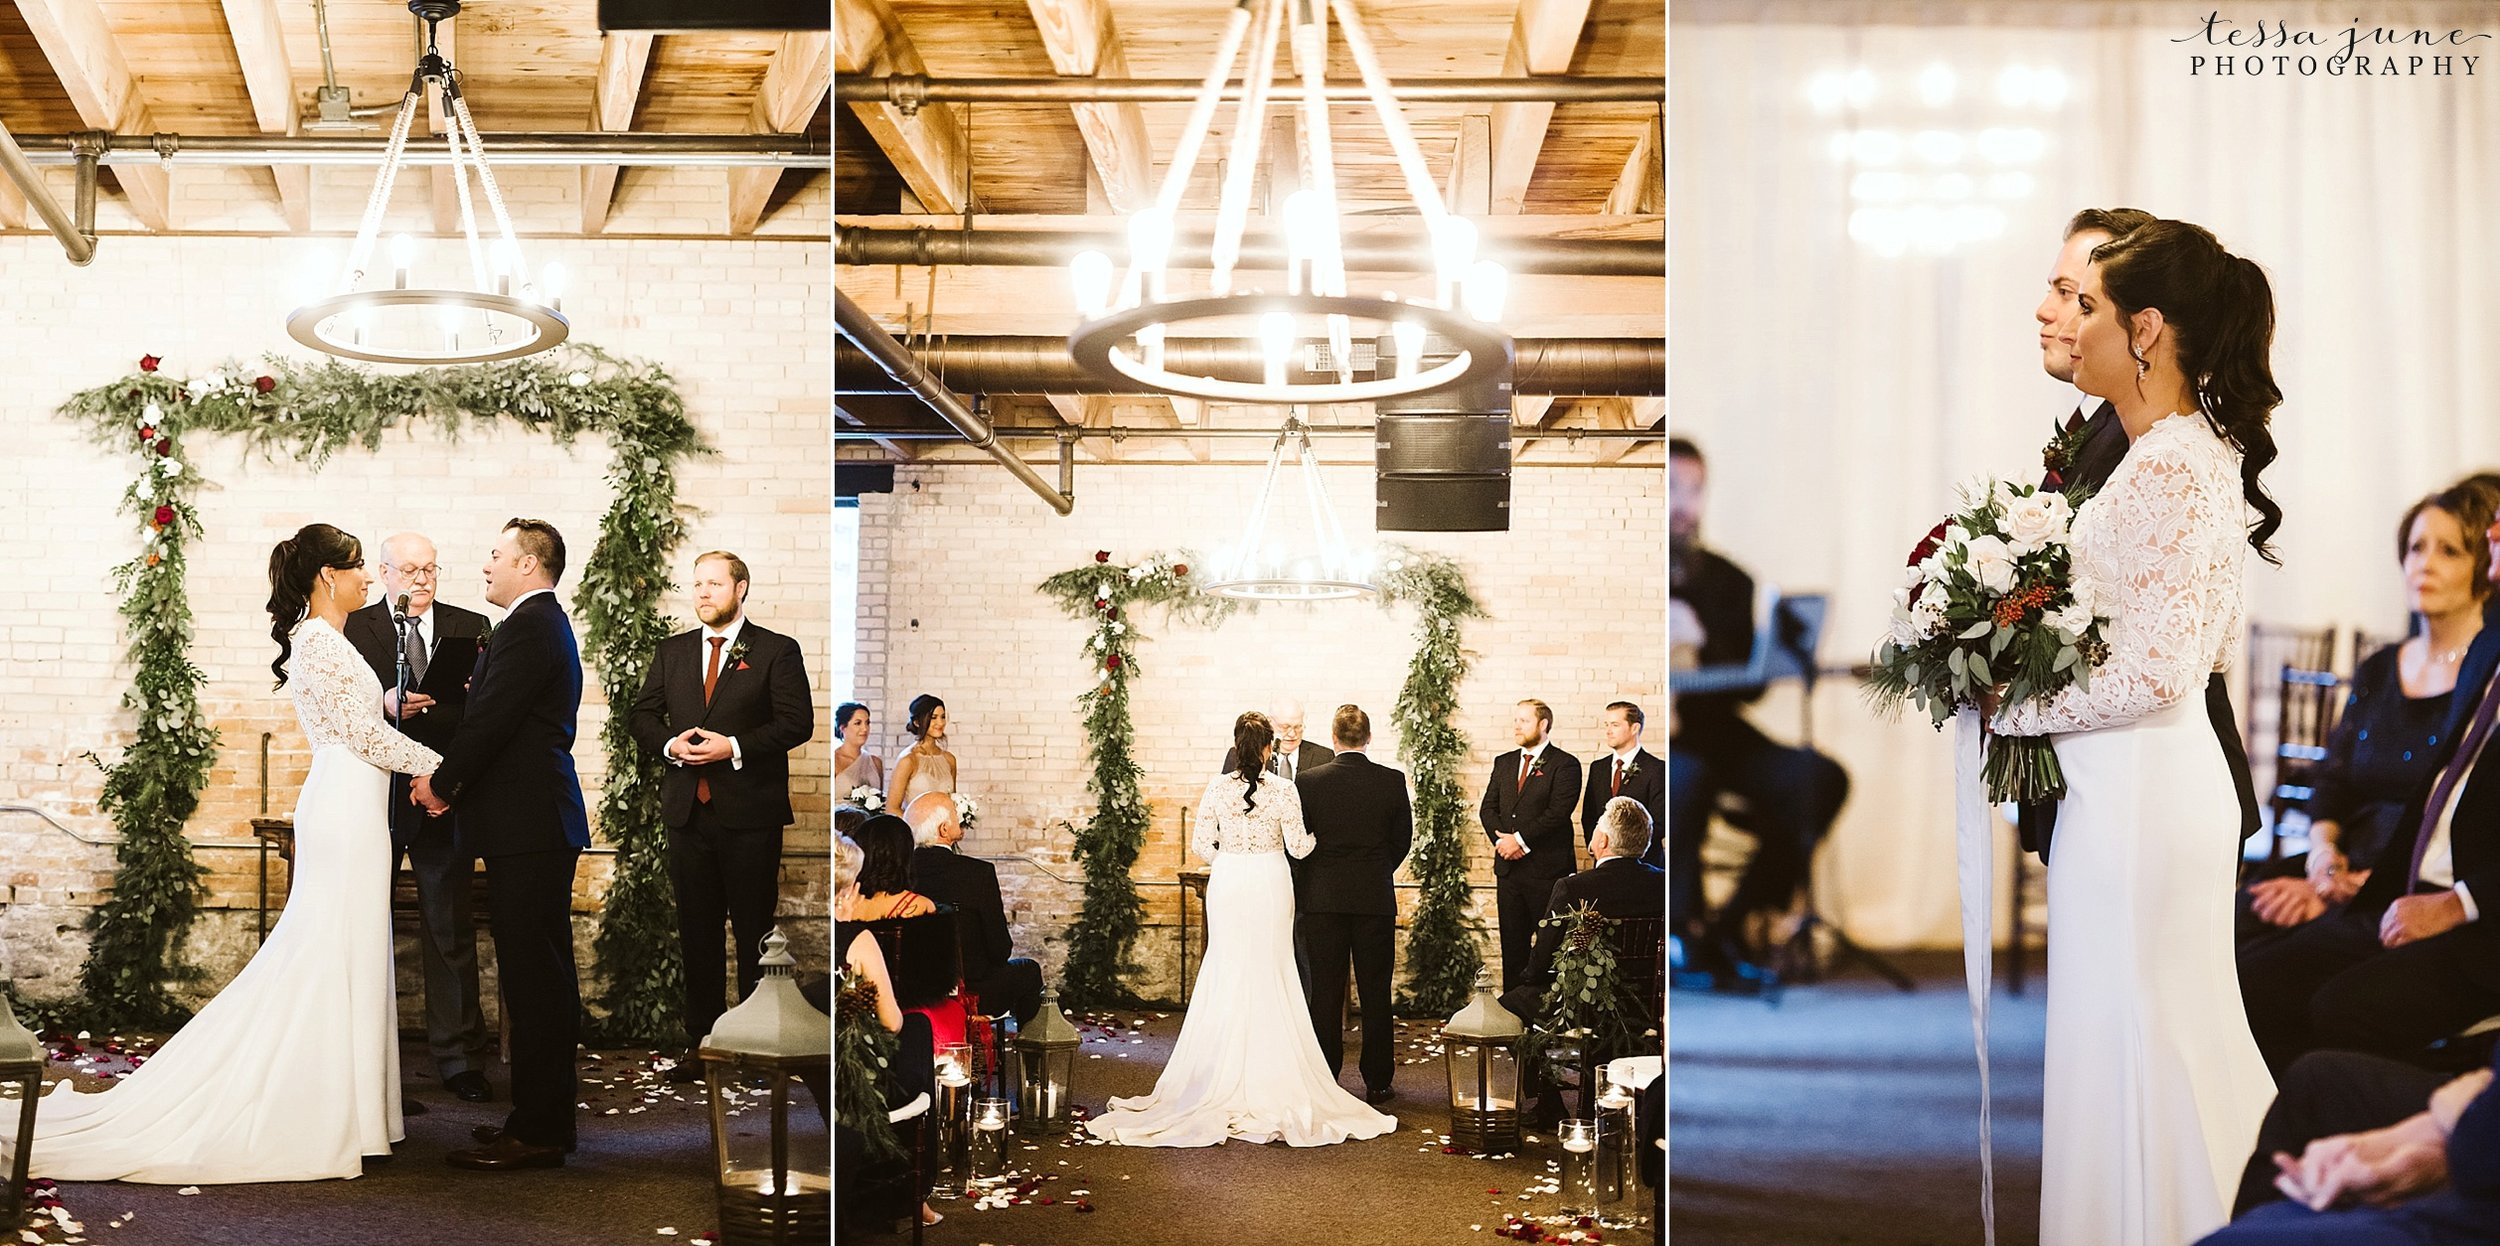 minneapolis-event-center-winter-romantic-snow-wedding-december-148.jpg